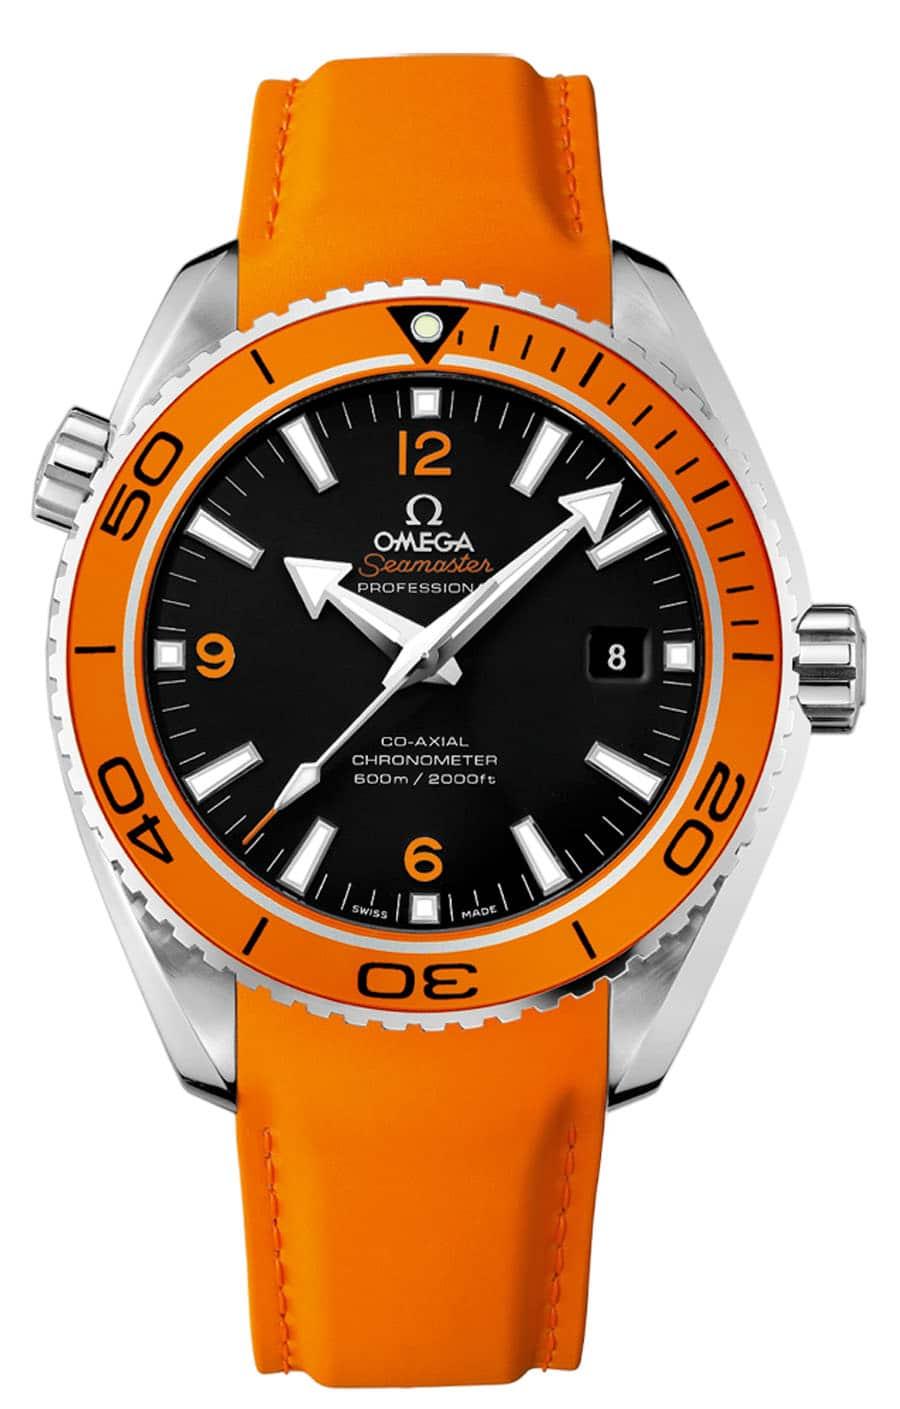 Omega: Seamaster Planet-Ocean in Orange